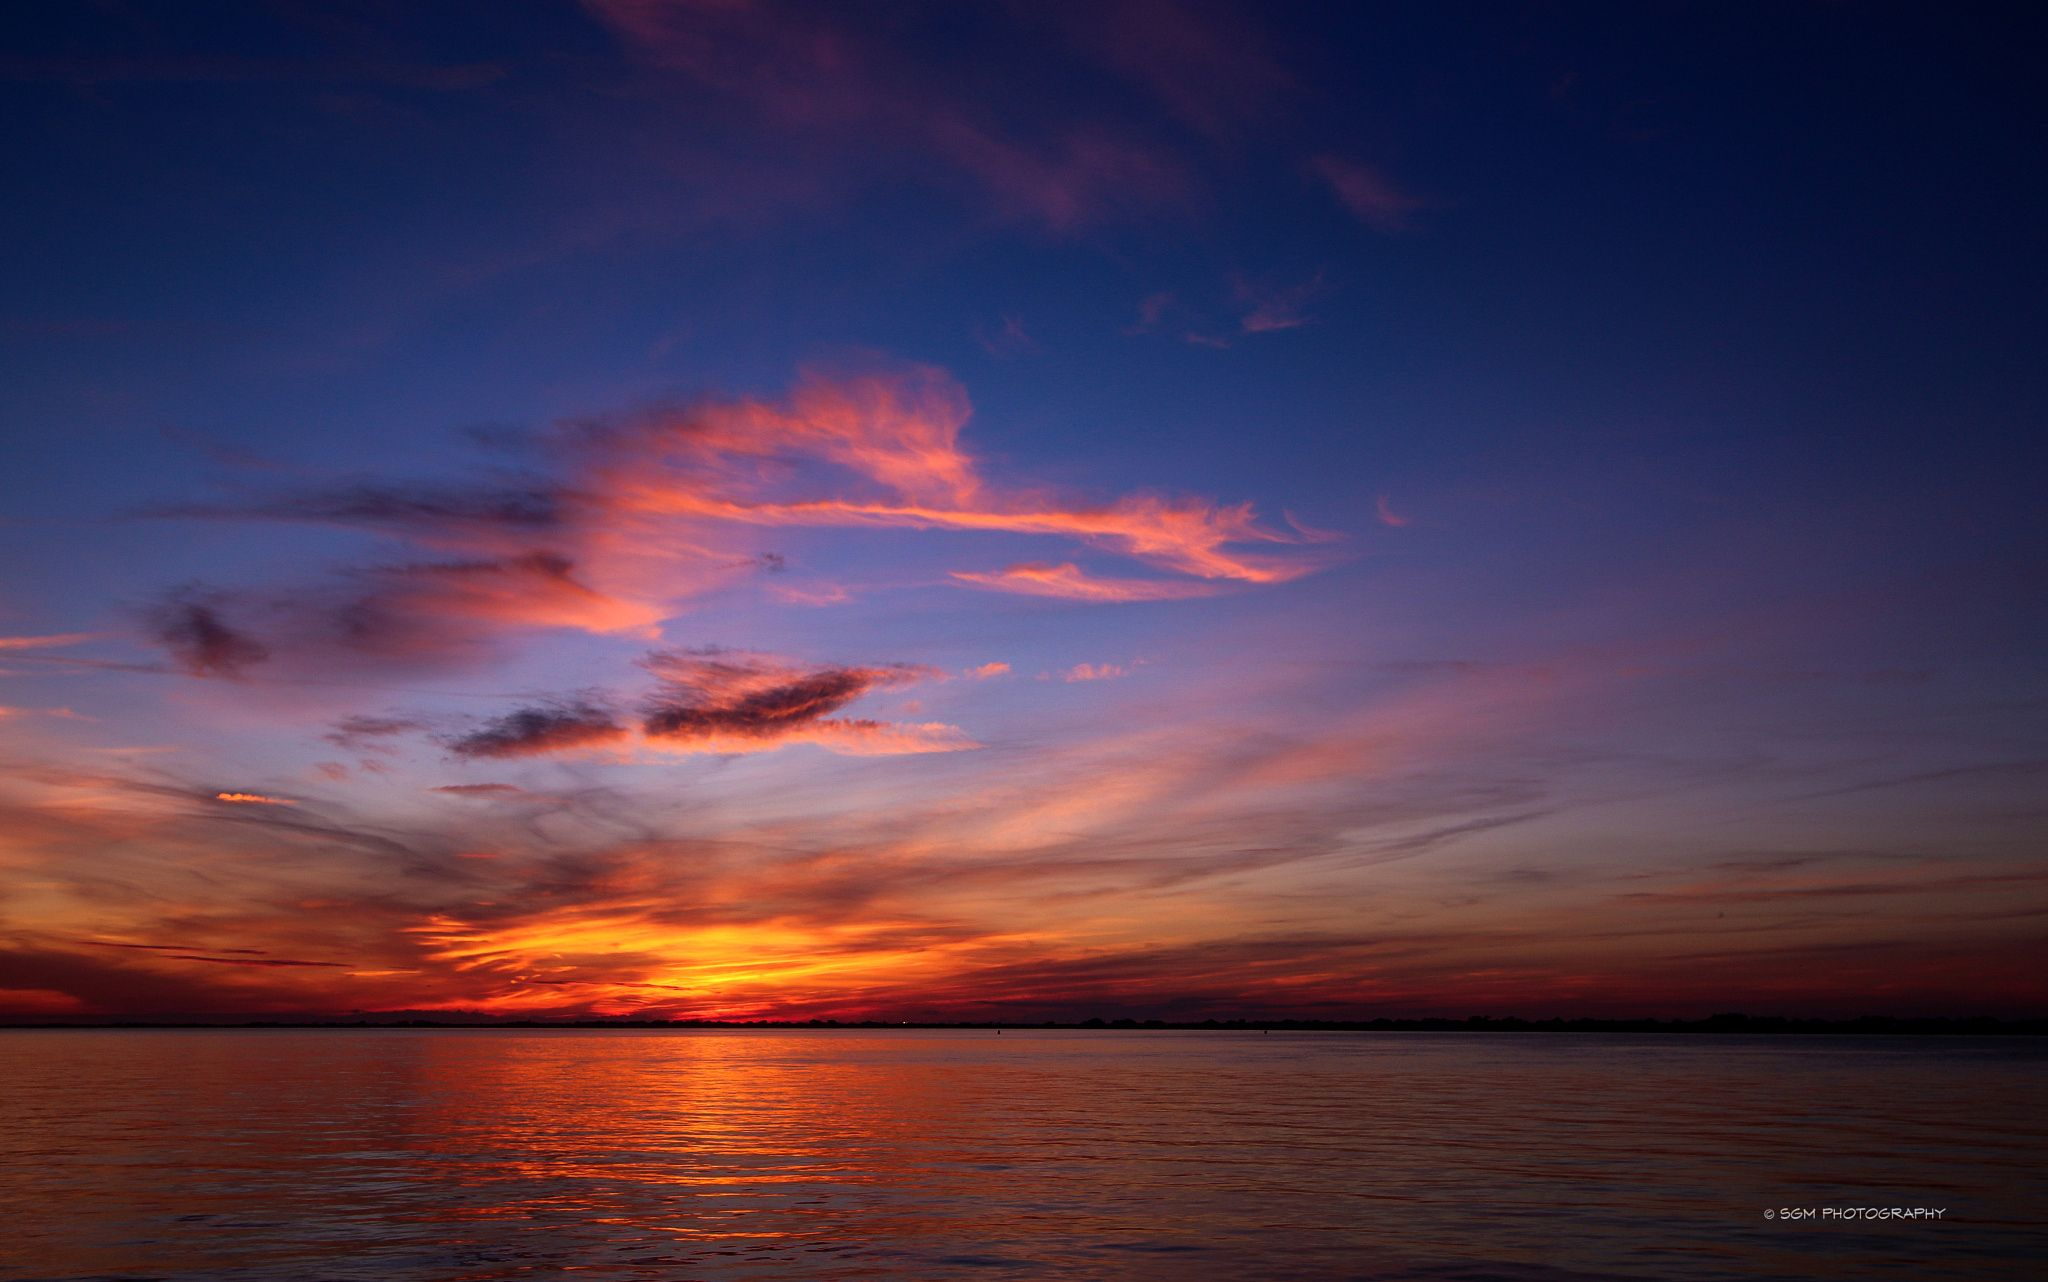 Photo Sky Fire @ Fire Island Inlet par Steve Mitchell on 500px